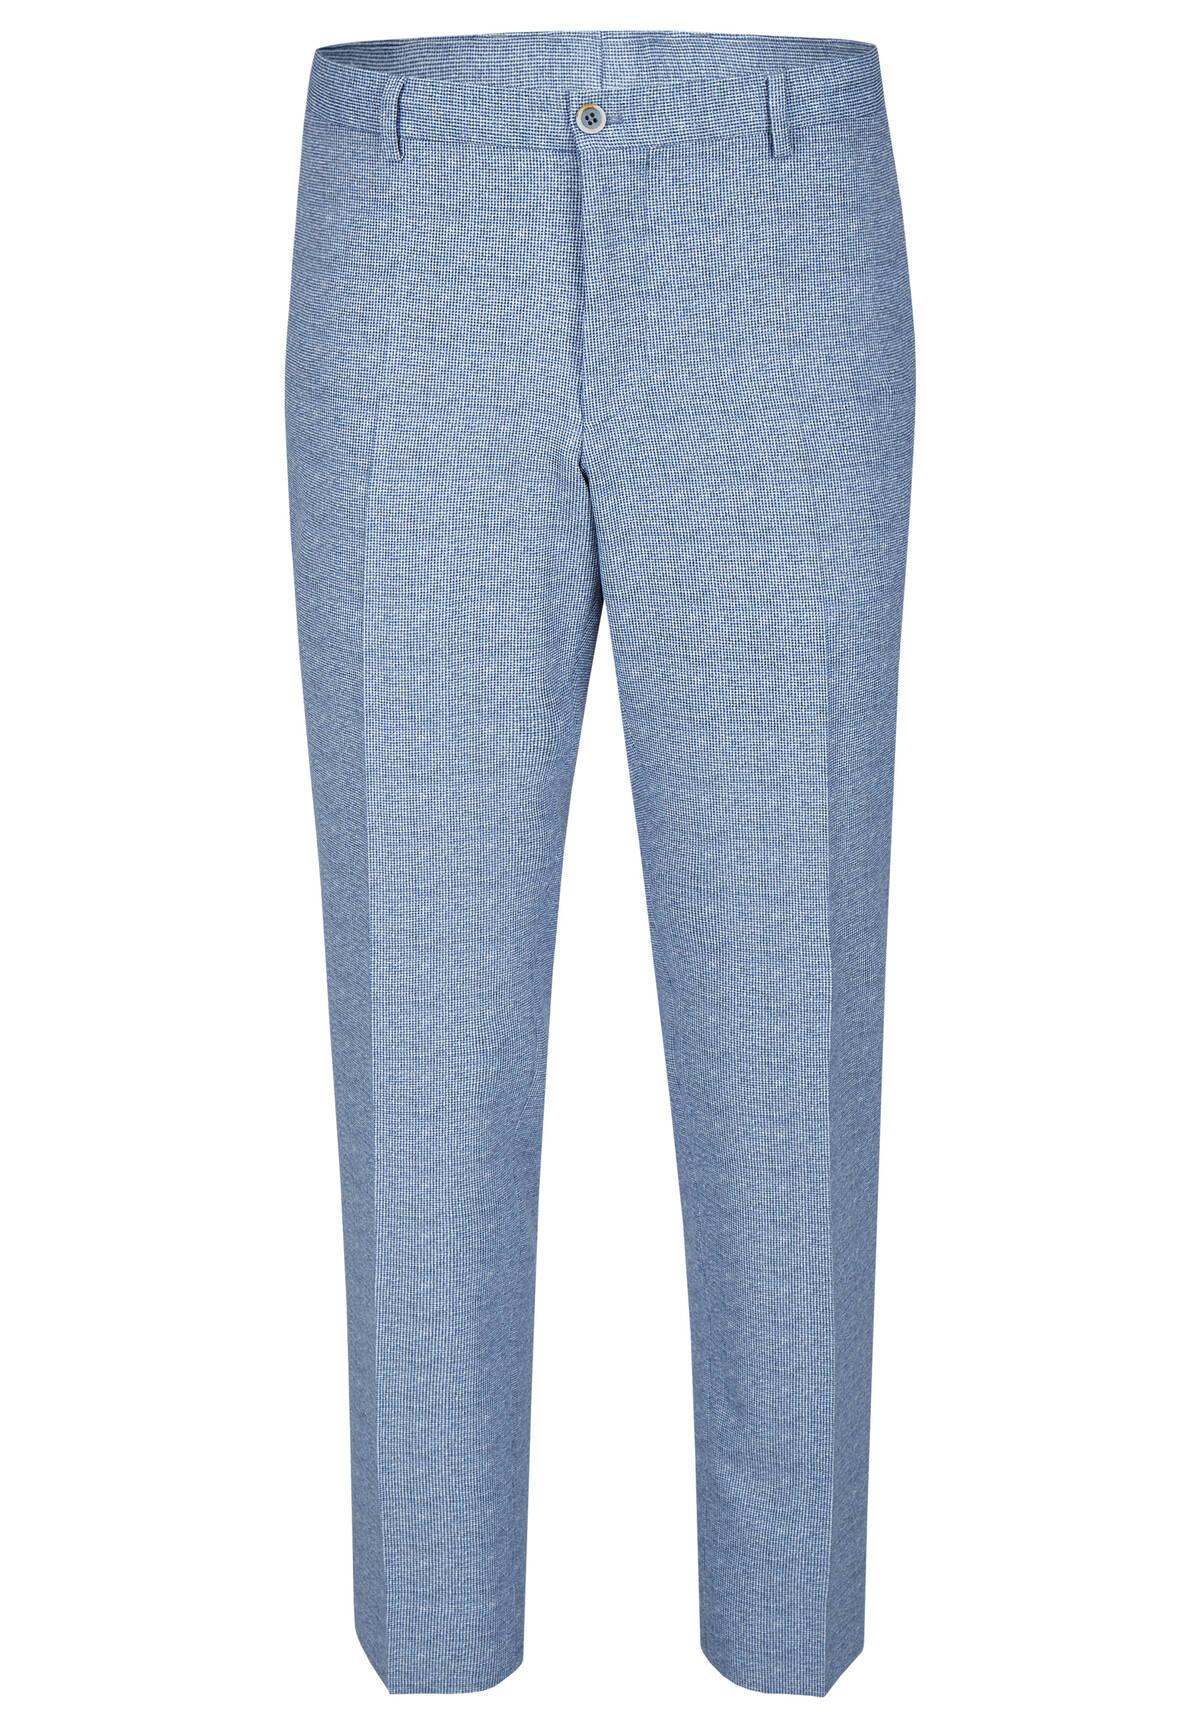 Pantalon de ostume DH XTENSION /